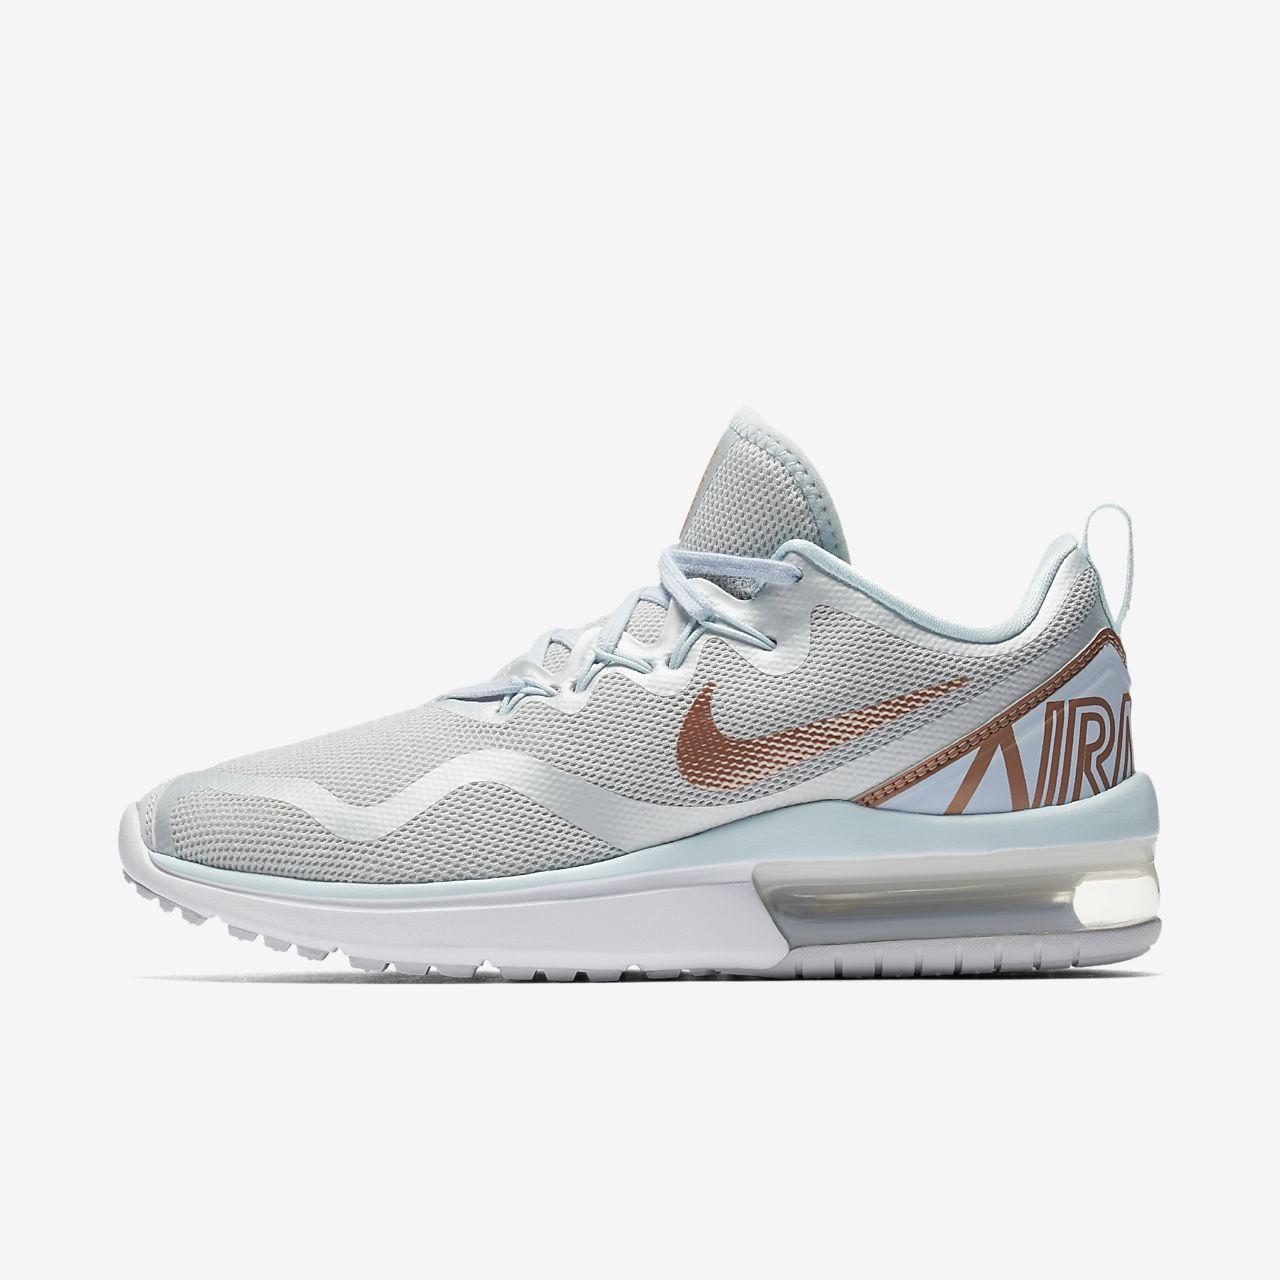 ... Nike Air Max Fury Explorer Women's Running Shoe